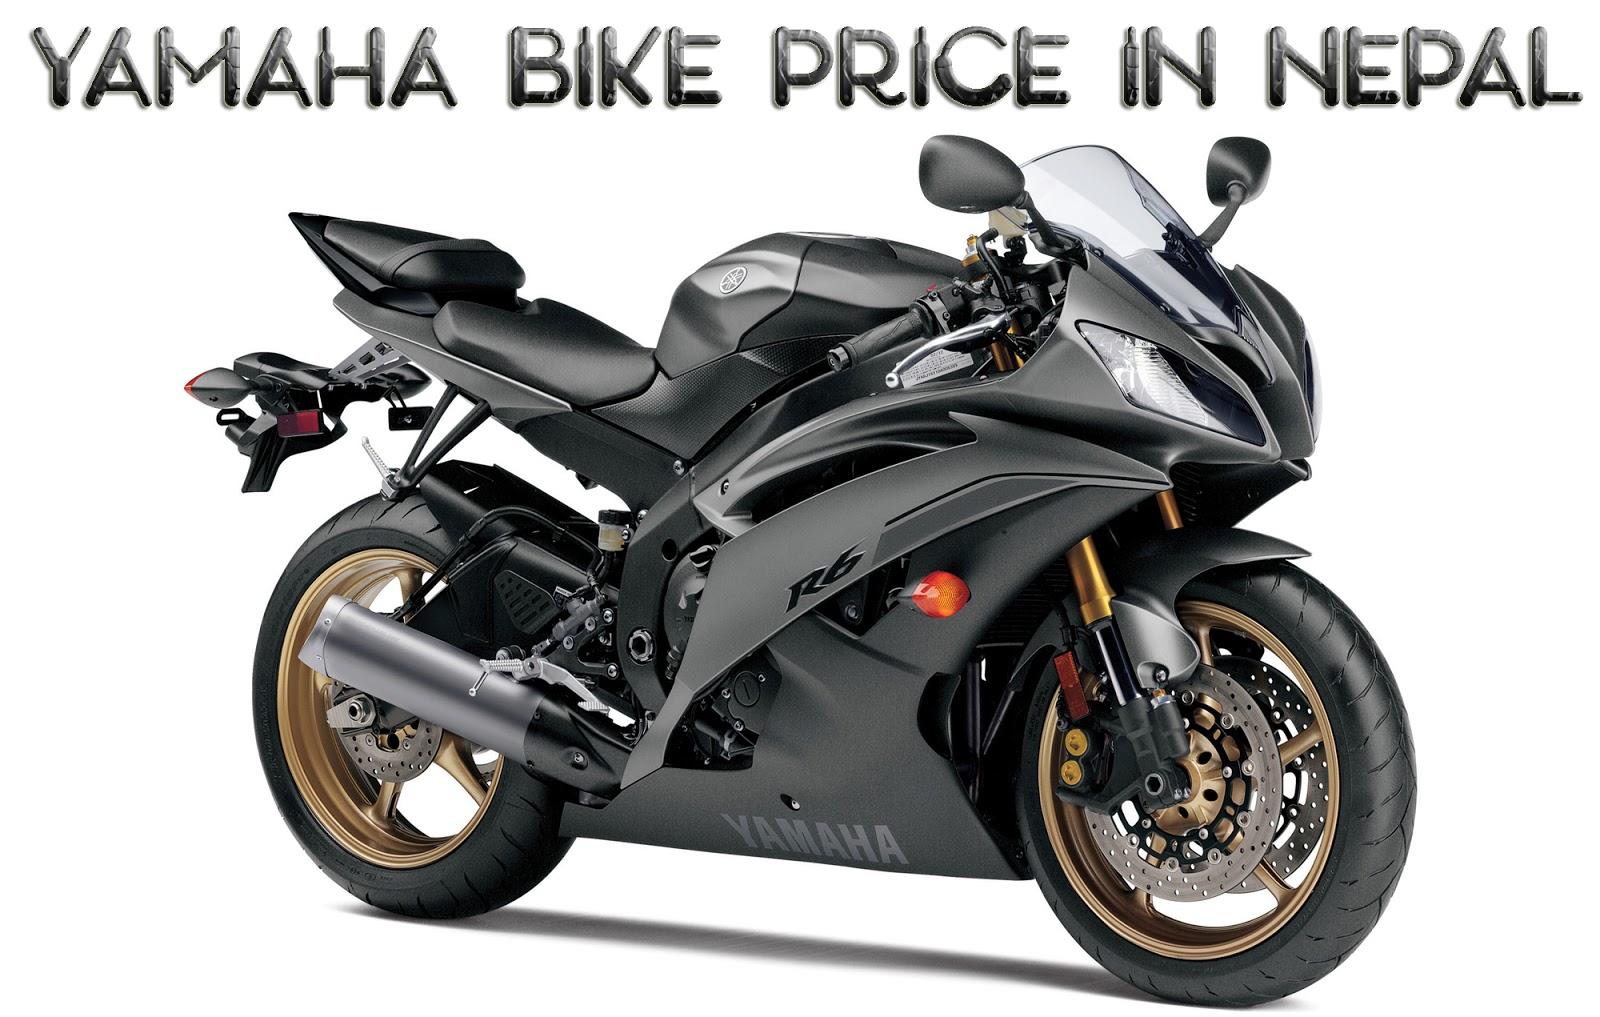 Yamaha bike prices and models in nepal nepali lab tech for Yamaha bikes price list